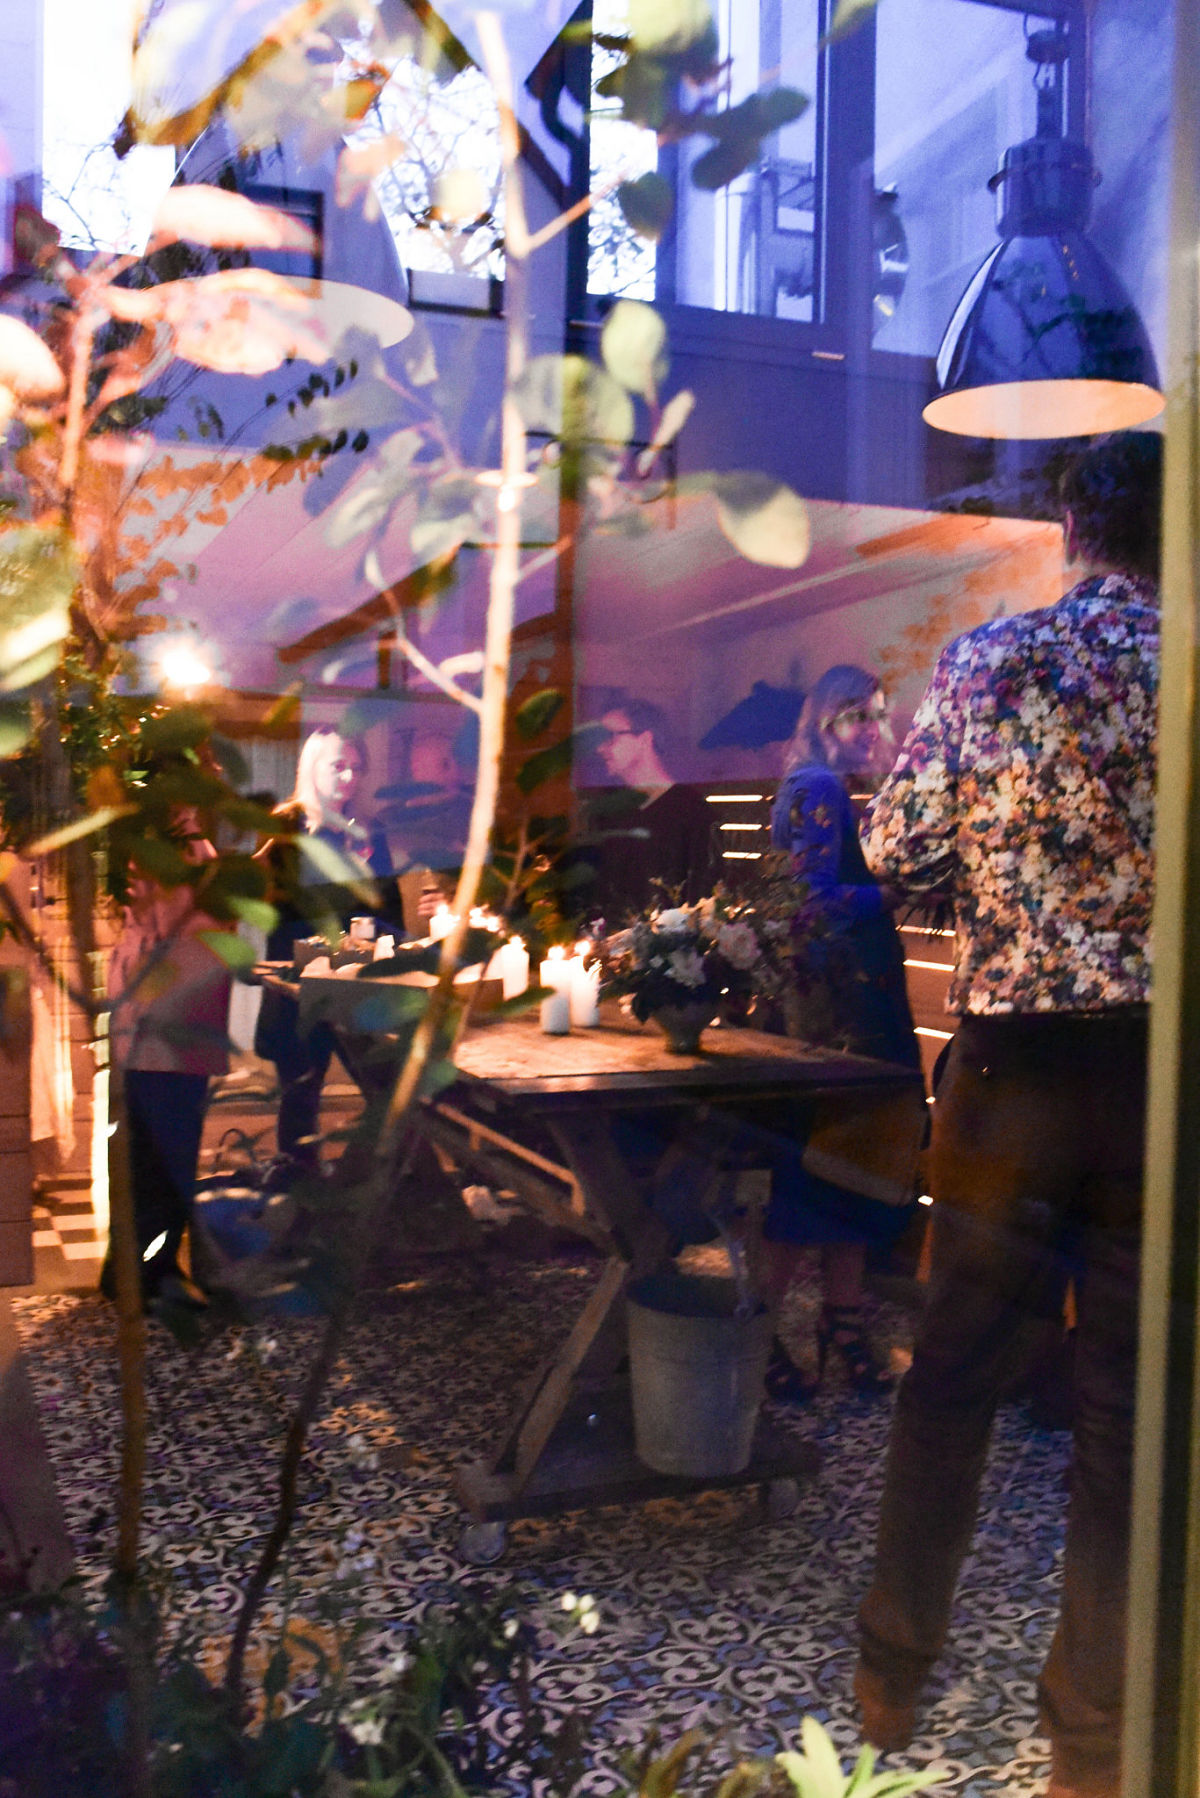 iko_osnabrück_ikoflowers_ikorestaurant_reneturrek_restaurantosnabrück (8).jpg